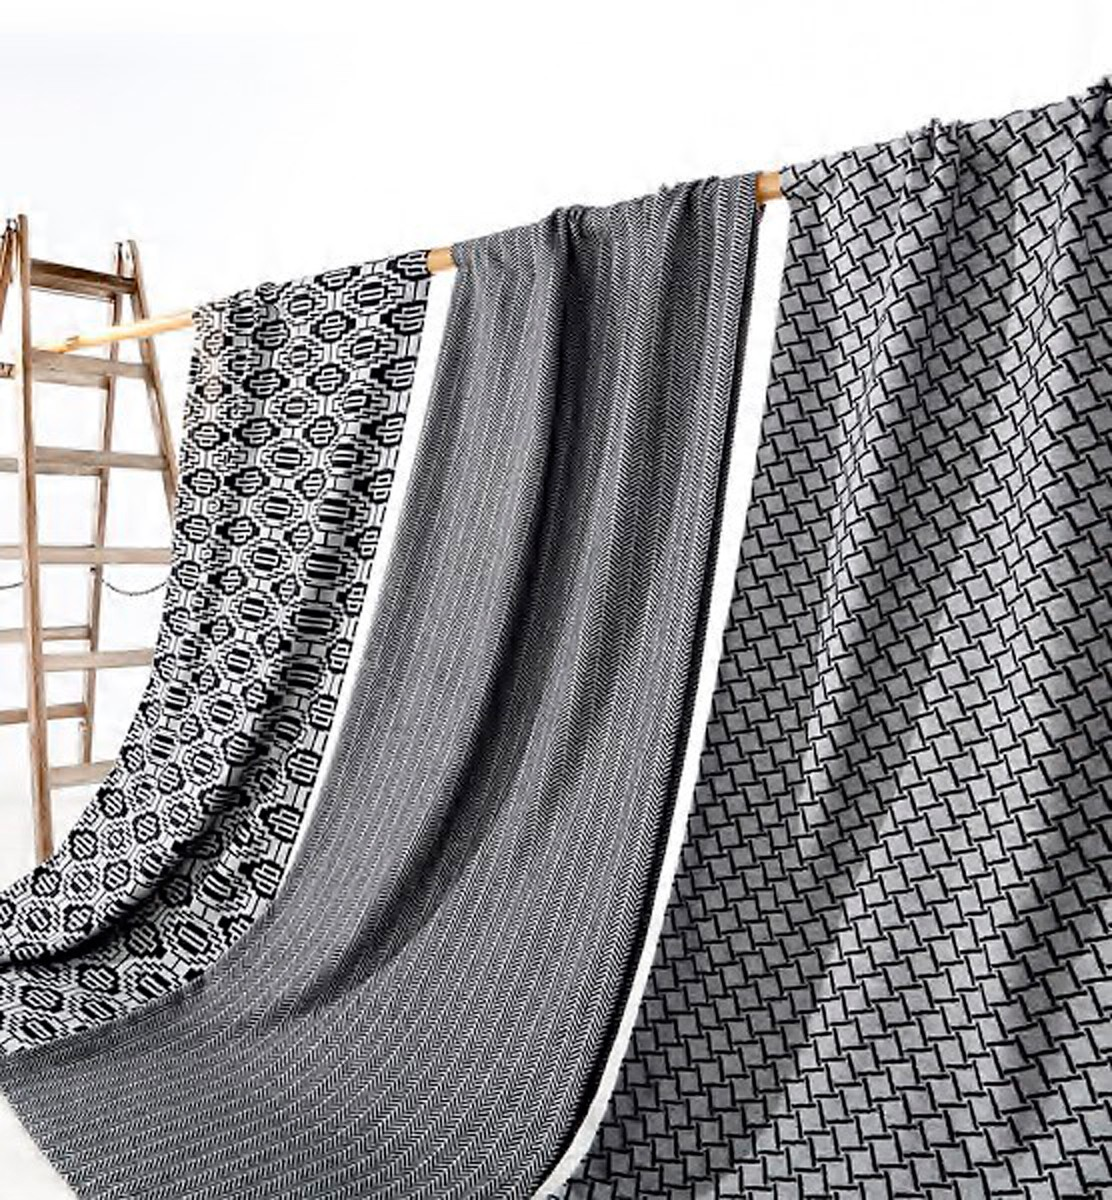 bocasa by biederlack scala wohndecke flavio 130x170 cm grau 3752. Black Bedroom Furniture Sets. Home Design Ideas